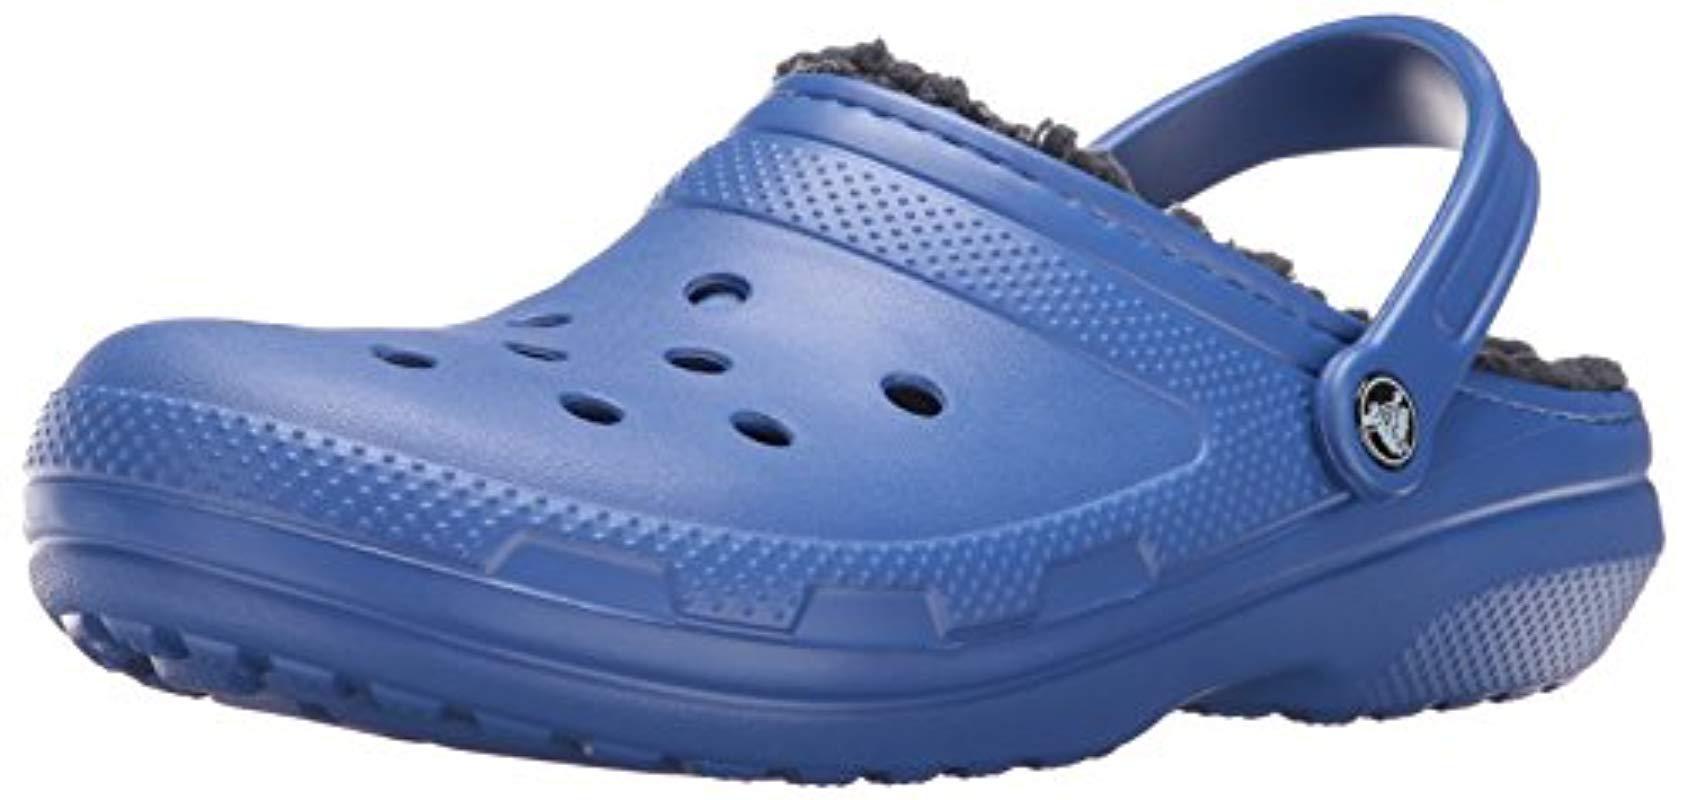 4a15d578e Lyst - Crocs™ And Classic Fuzz Lined Clog Shoe